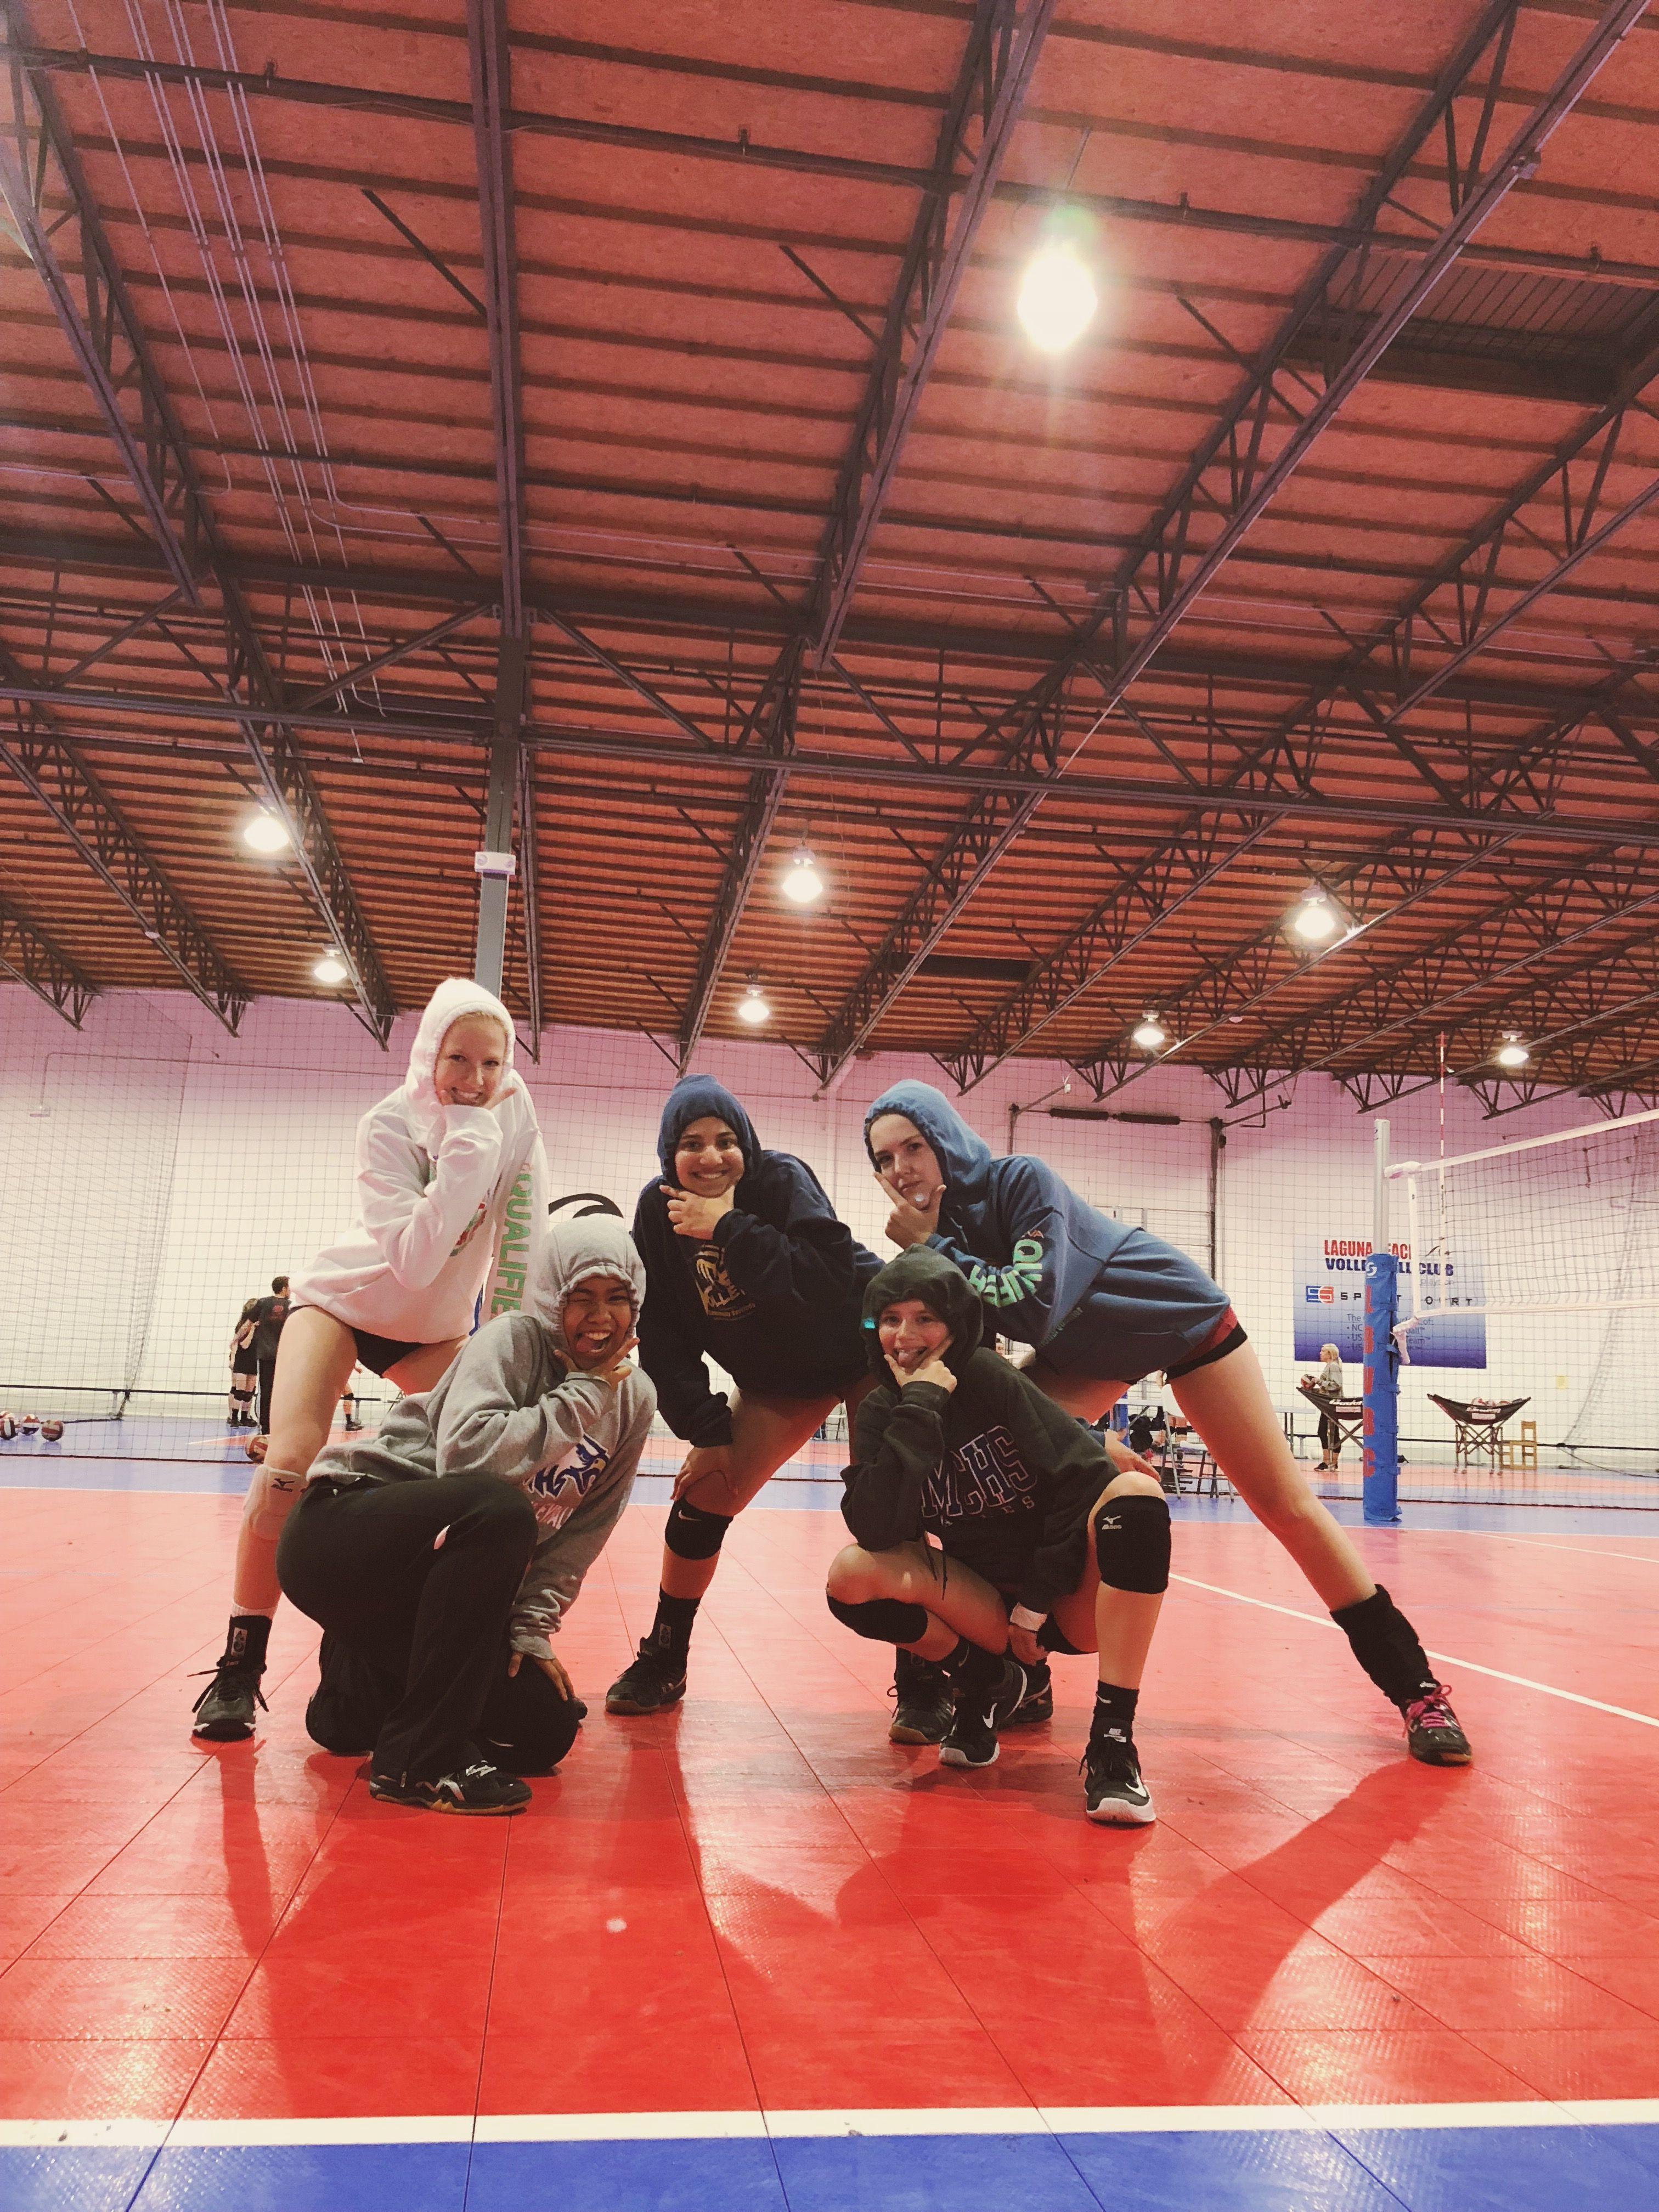 Pin De Karen Ramirez En Voley Tumblr Voleibol Voley